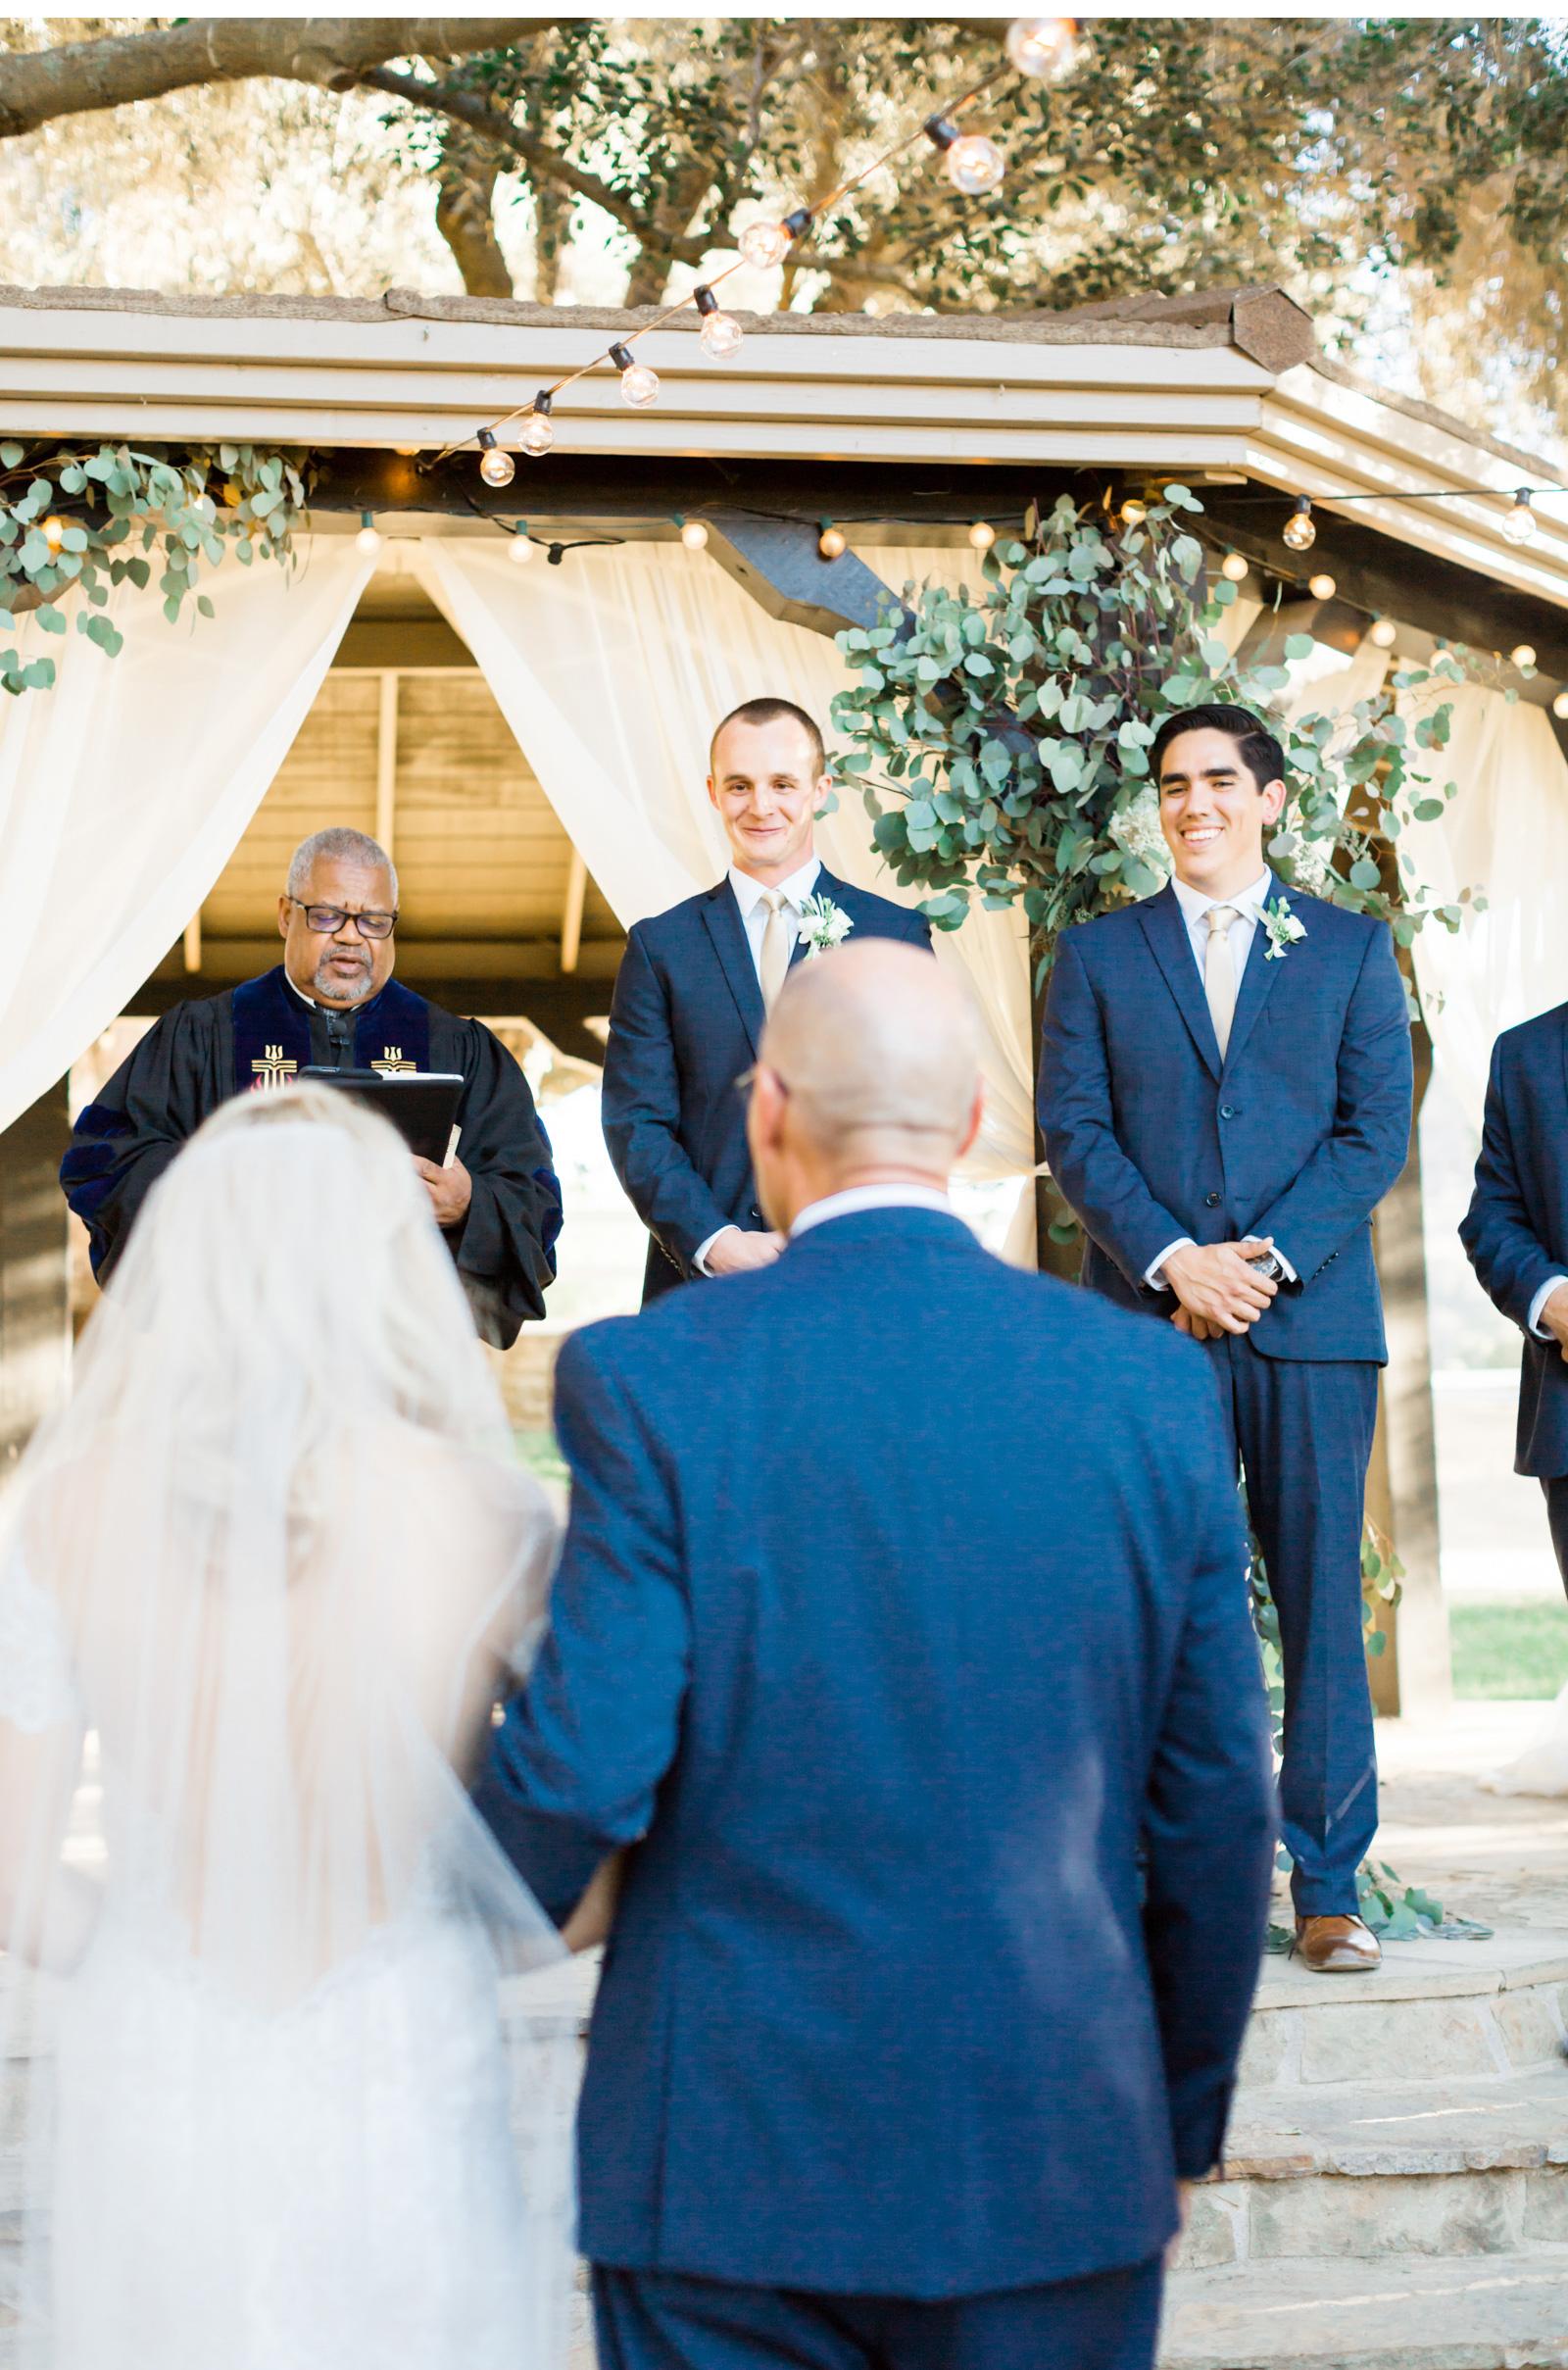 San-Luis-Obispo-Wedding-Photographer-Style-Me-Pretty-Natalie-Schutt-Photography_13.jpg